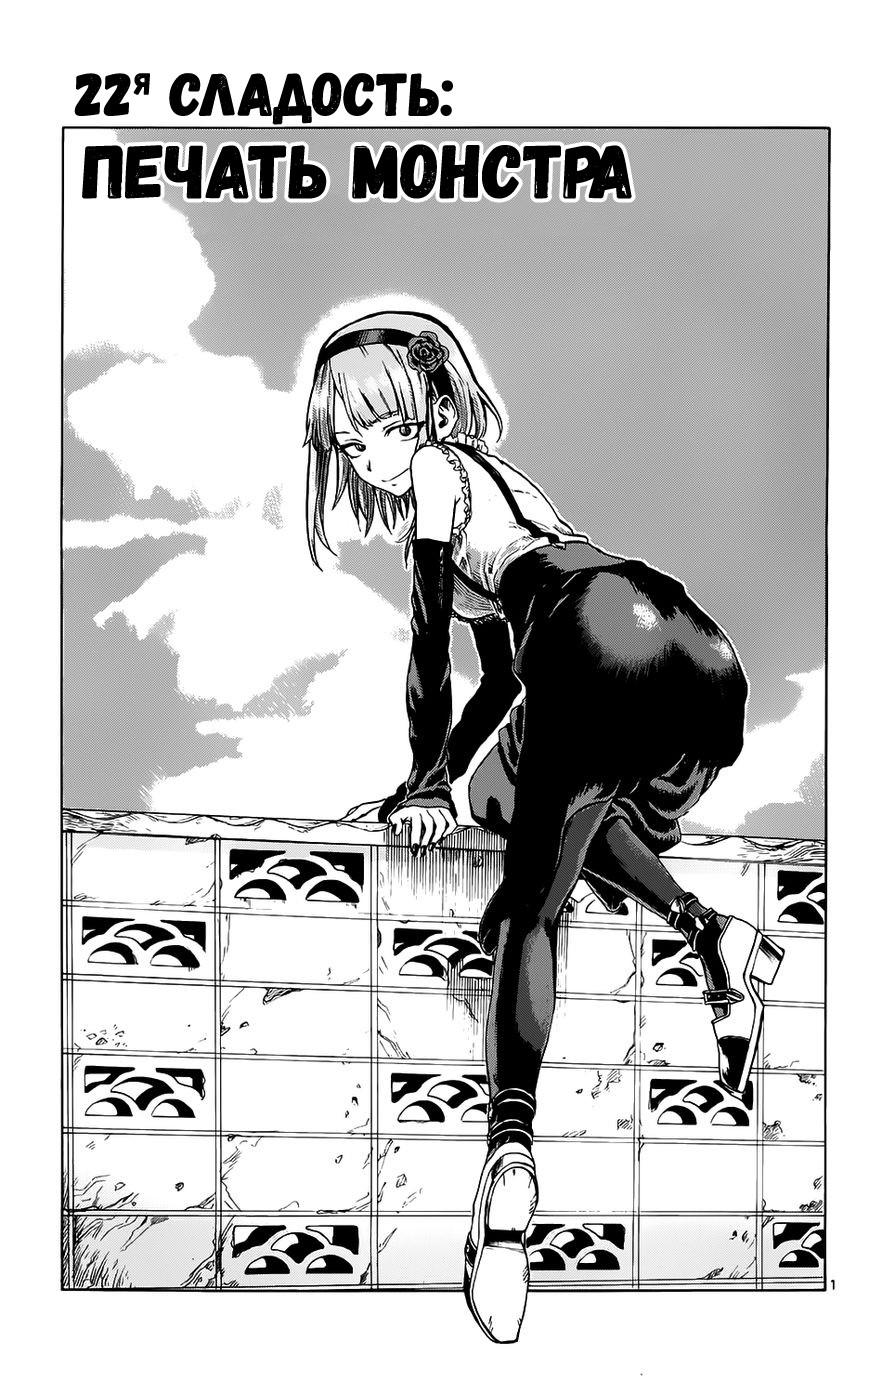 https://r1.ninemanga.com/comics/pic2/52/27572/410882/1522462390601.jpg Page 1